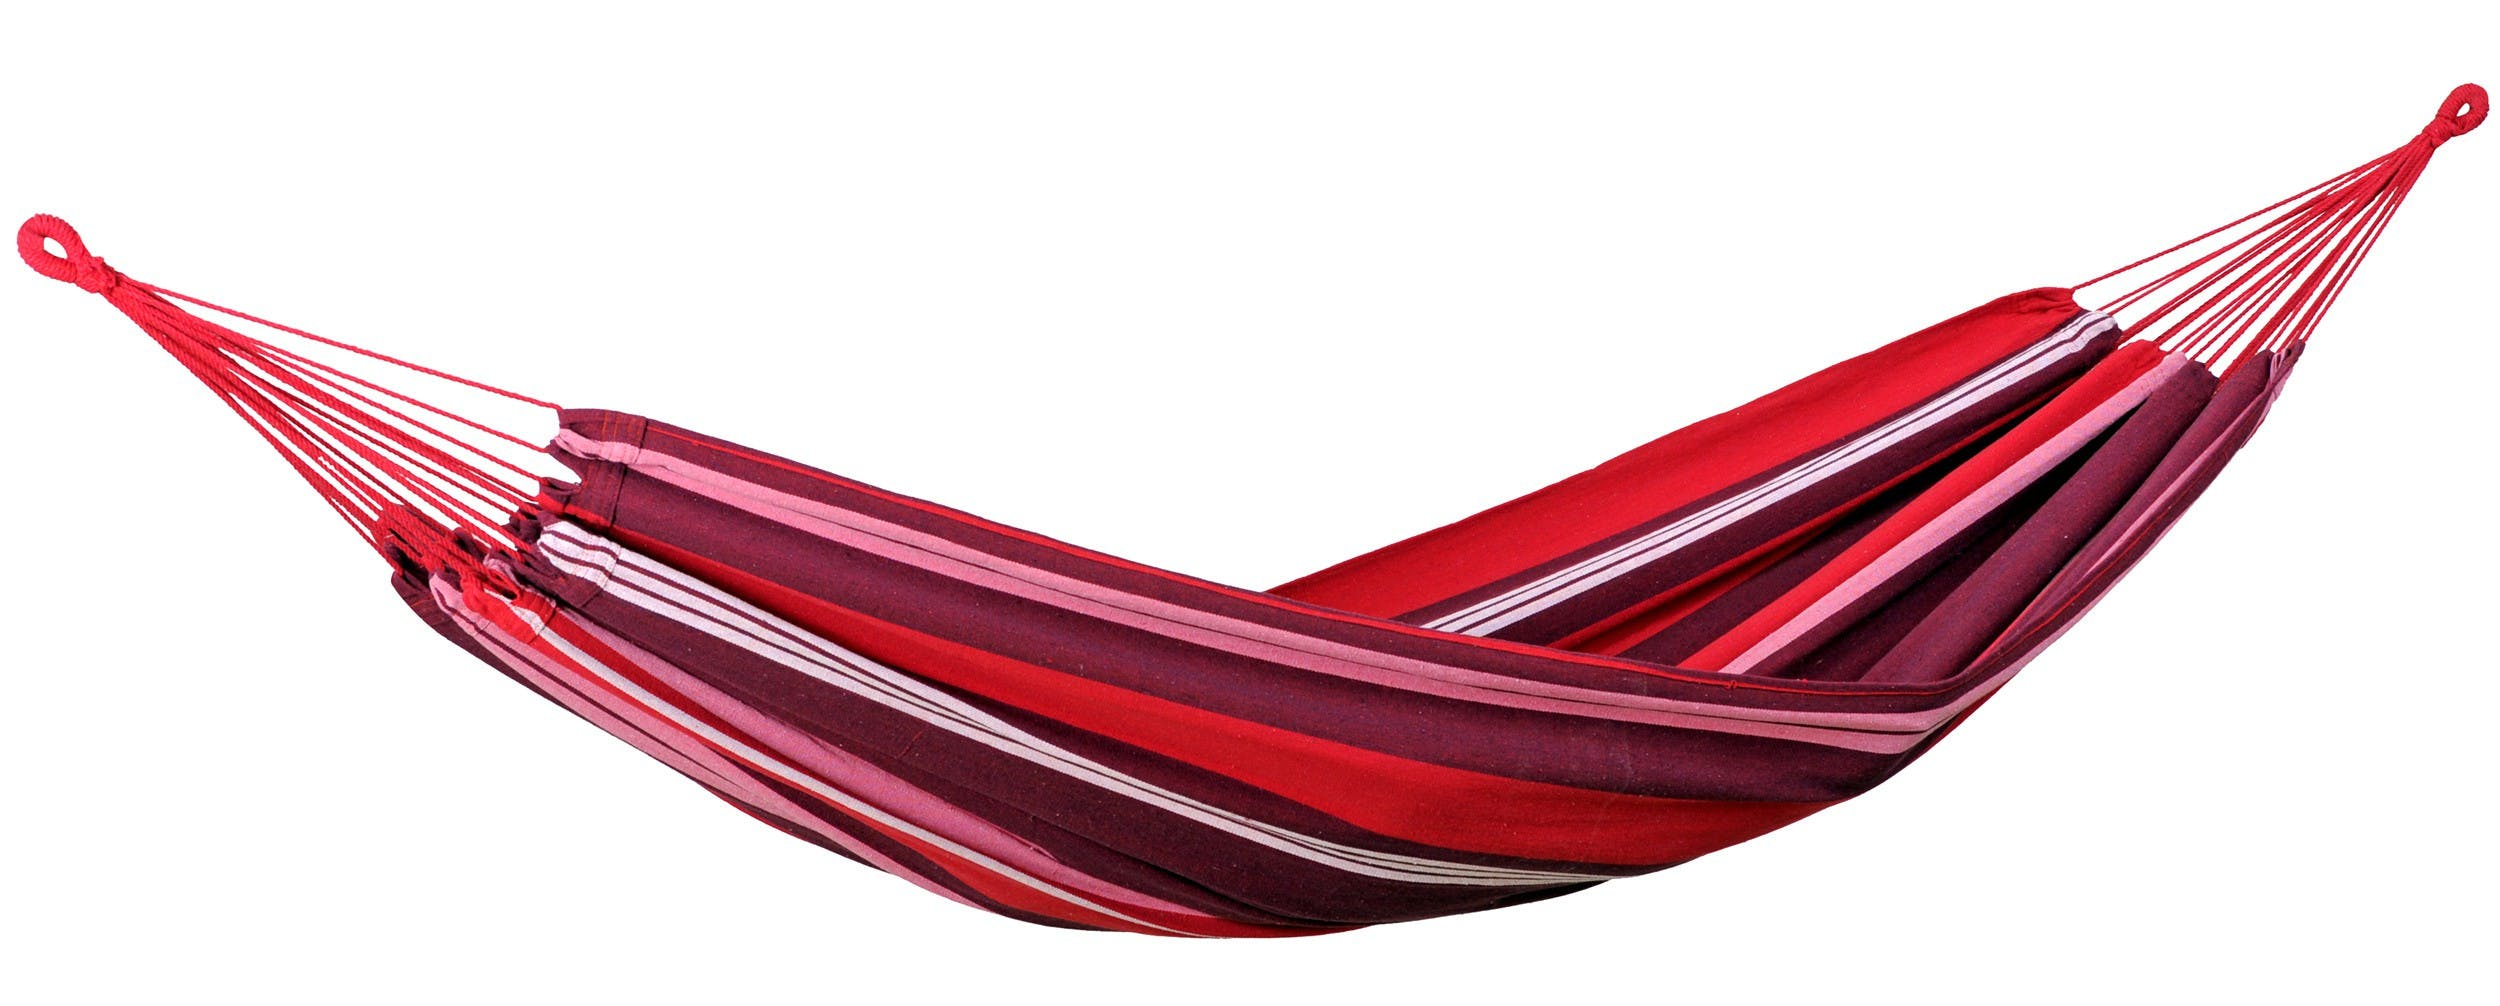 Hamac de jardin XL SALSA Fuego Rouge rose 210x140cm AMAZONAS